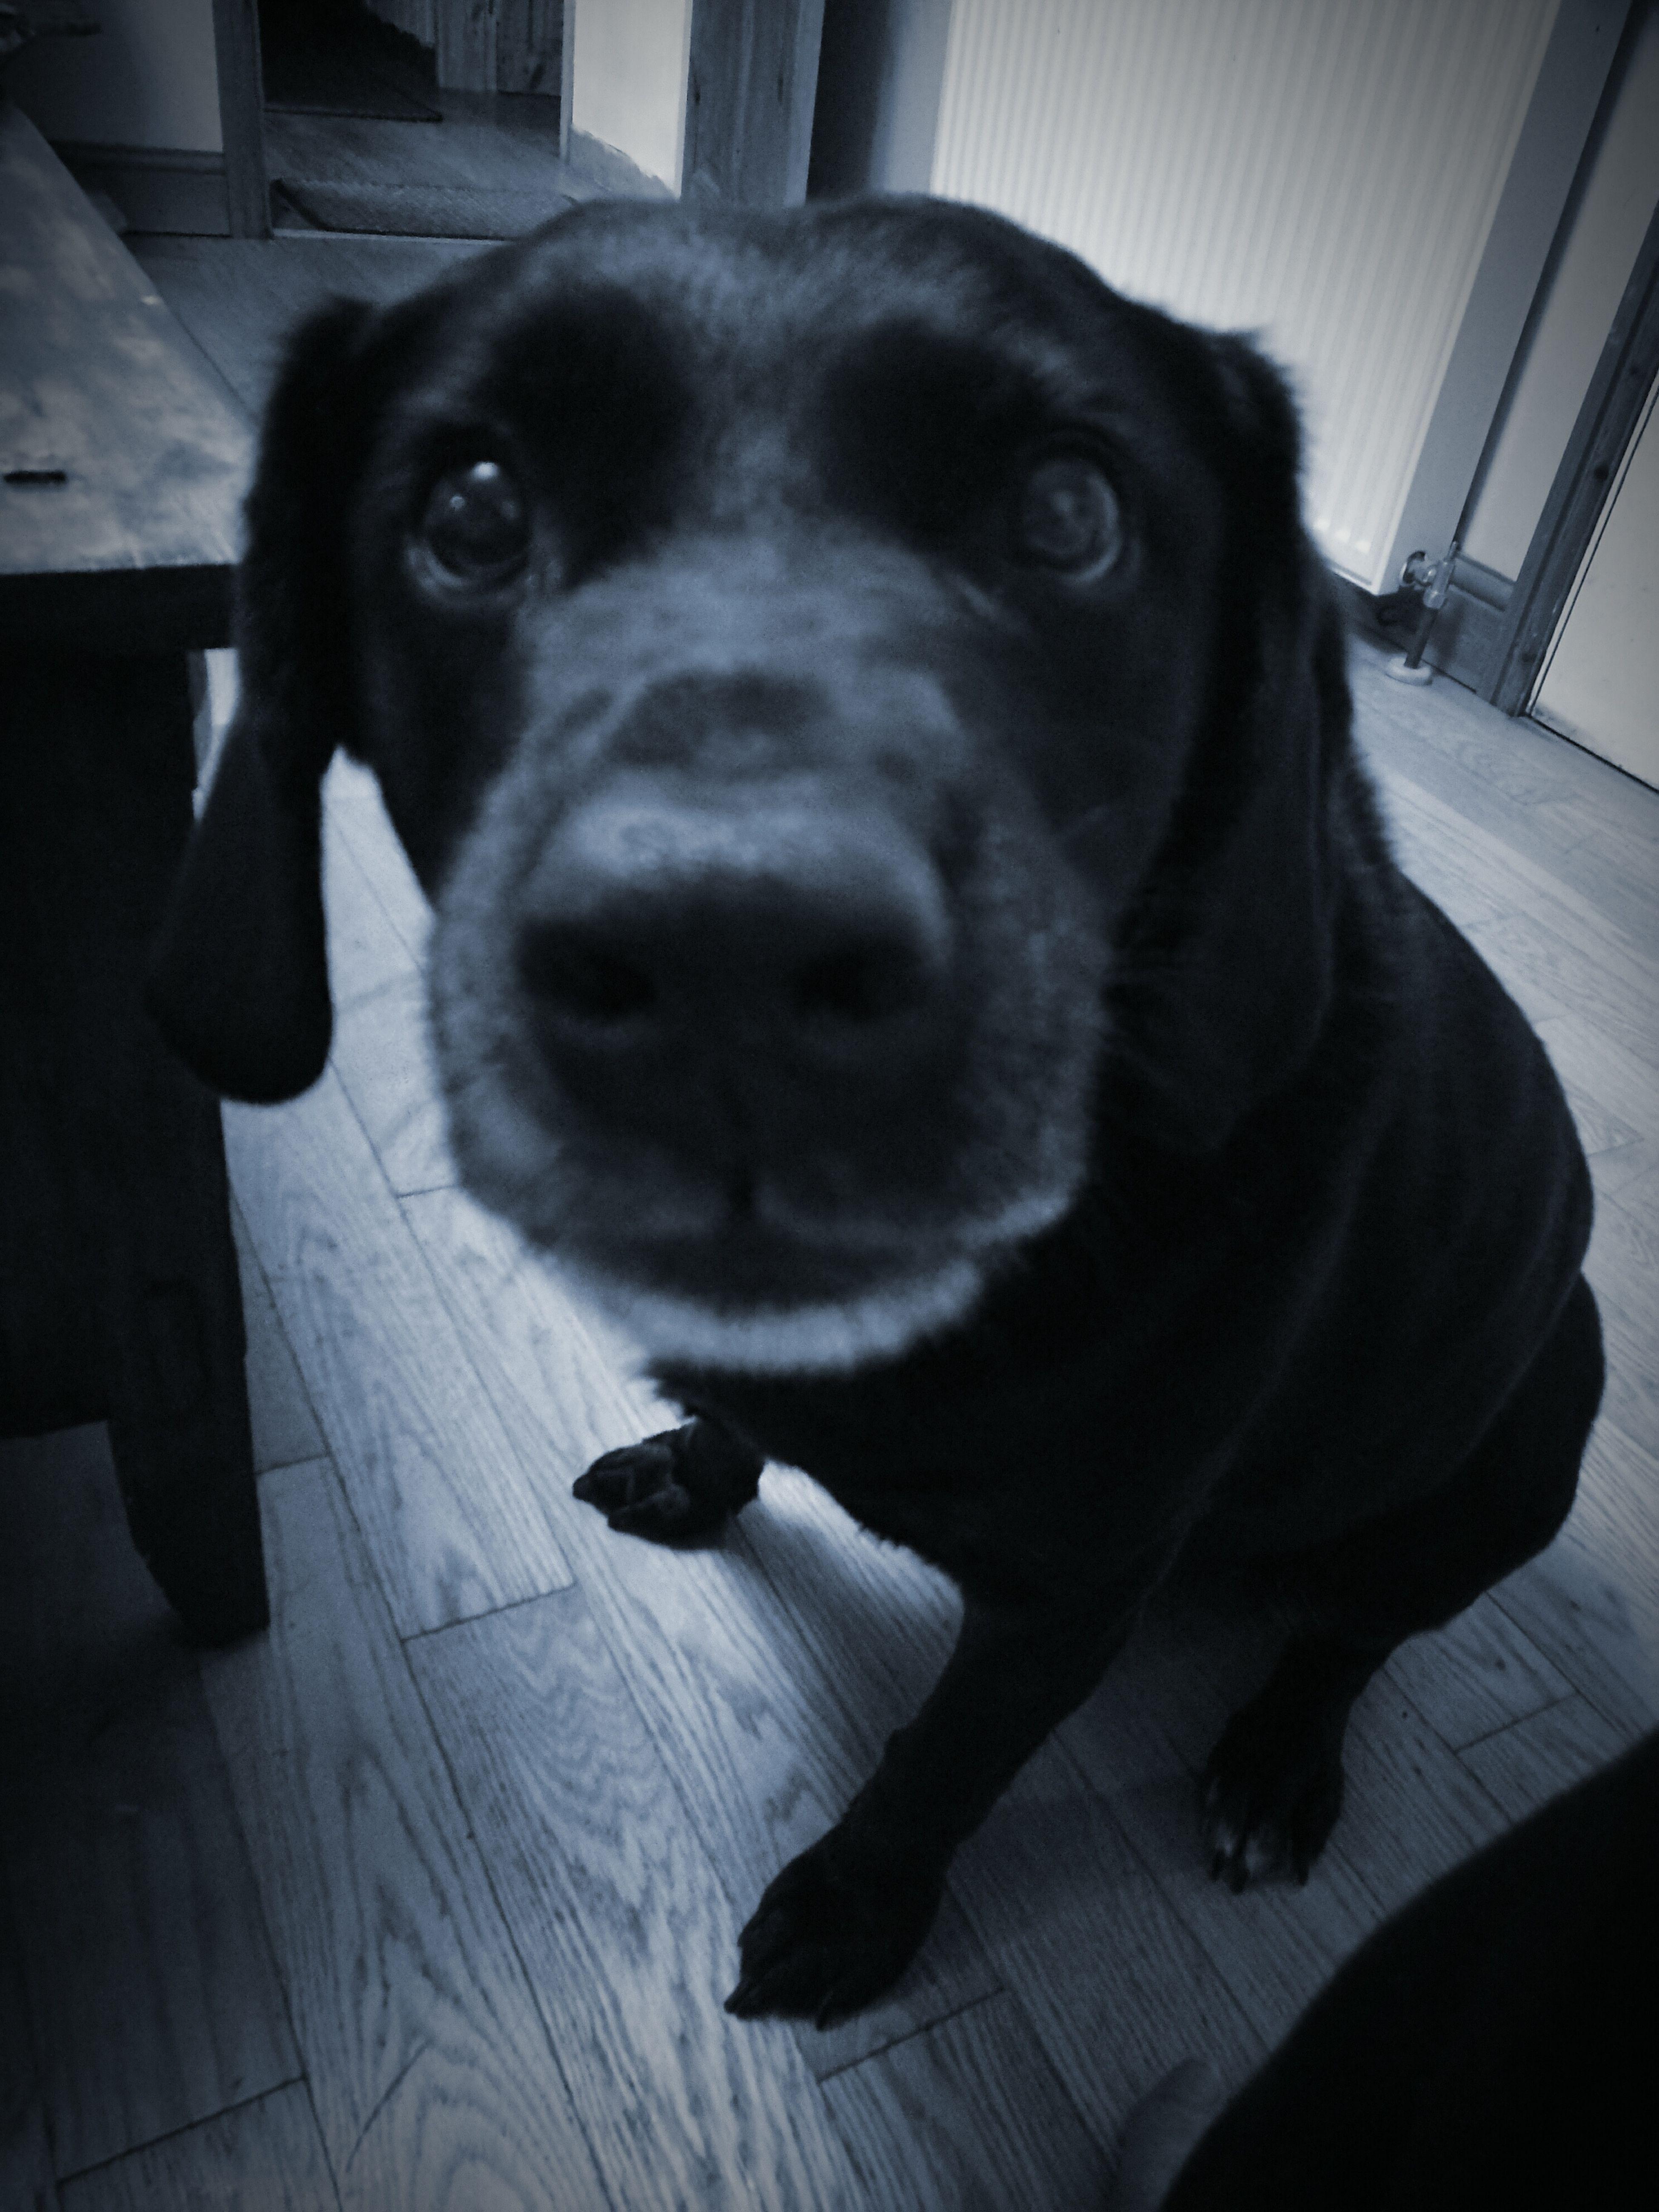 Grumpy.. (イライラする) Pets Domestic Animals Dog イライラするLooking At Camera Indoors  No People Grumpy Annoyed Close-up